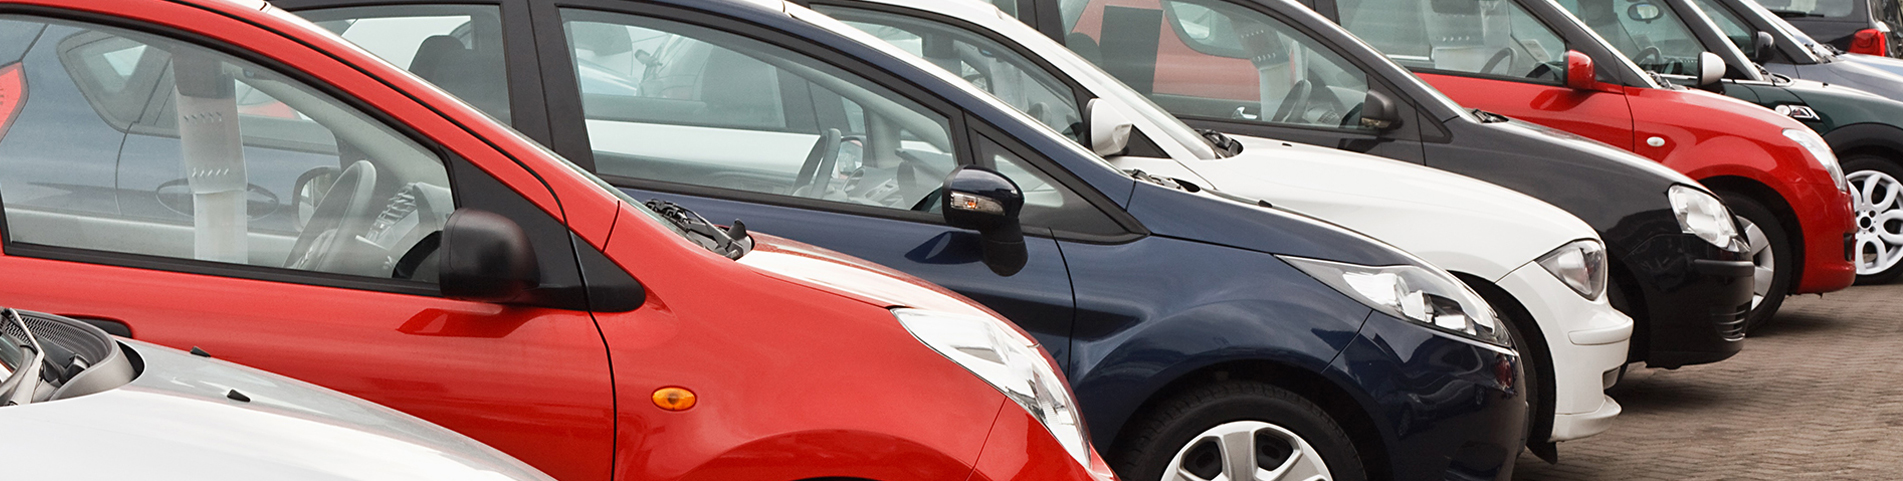 Autoline Car Sales Clane